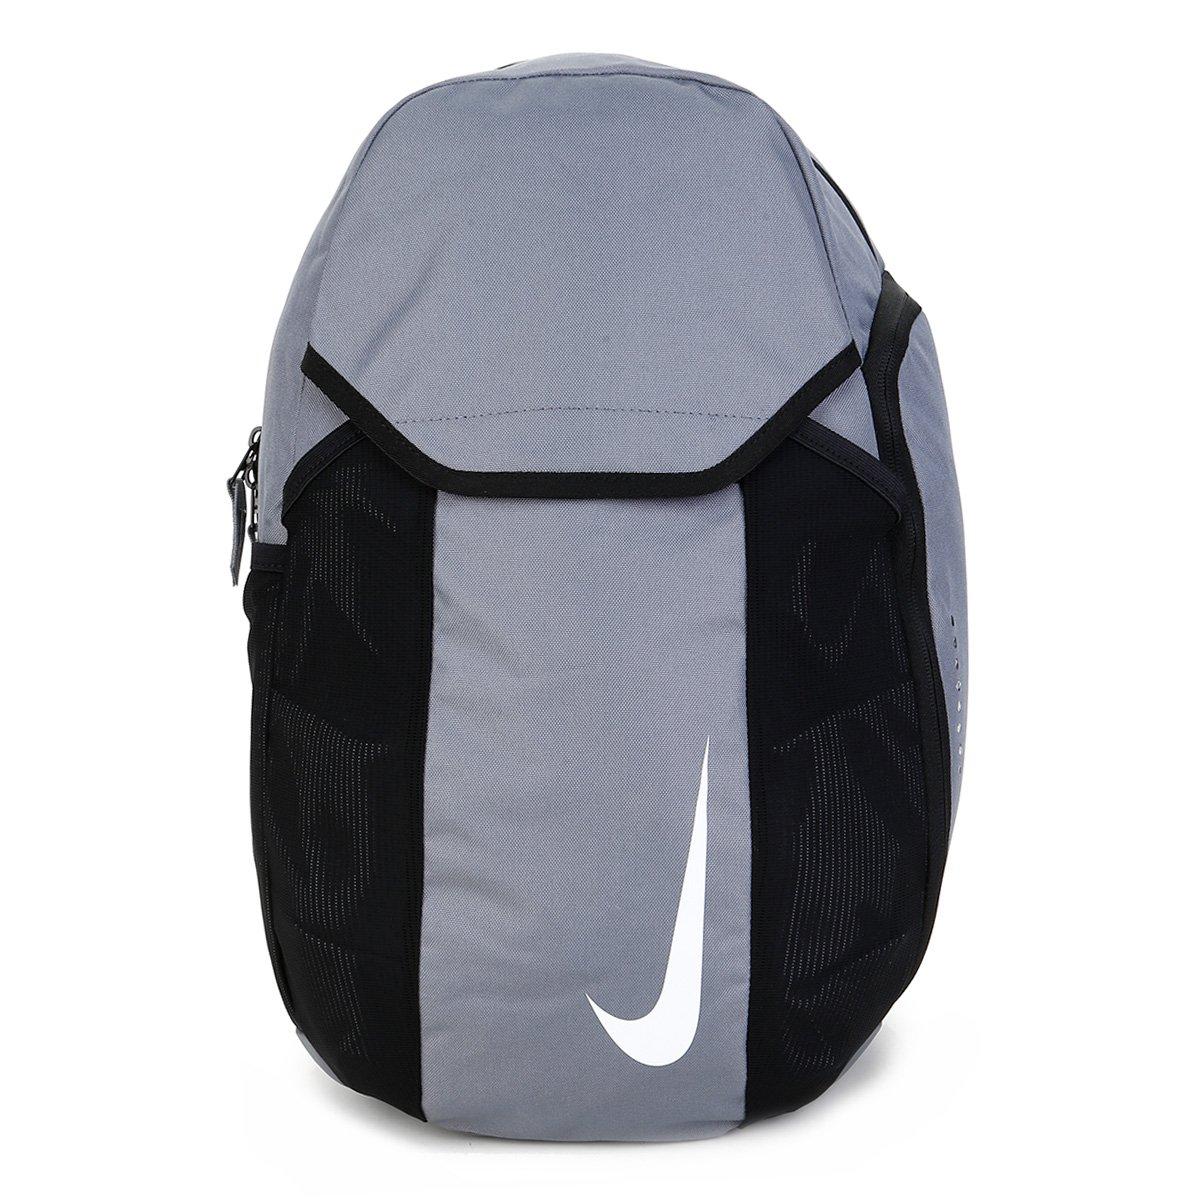 Team Cinza Academy E Nike Preto Mochila l1cK3JTF